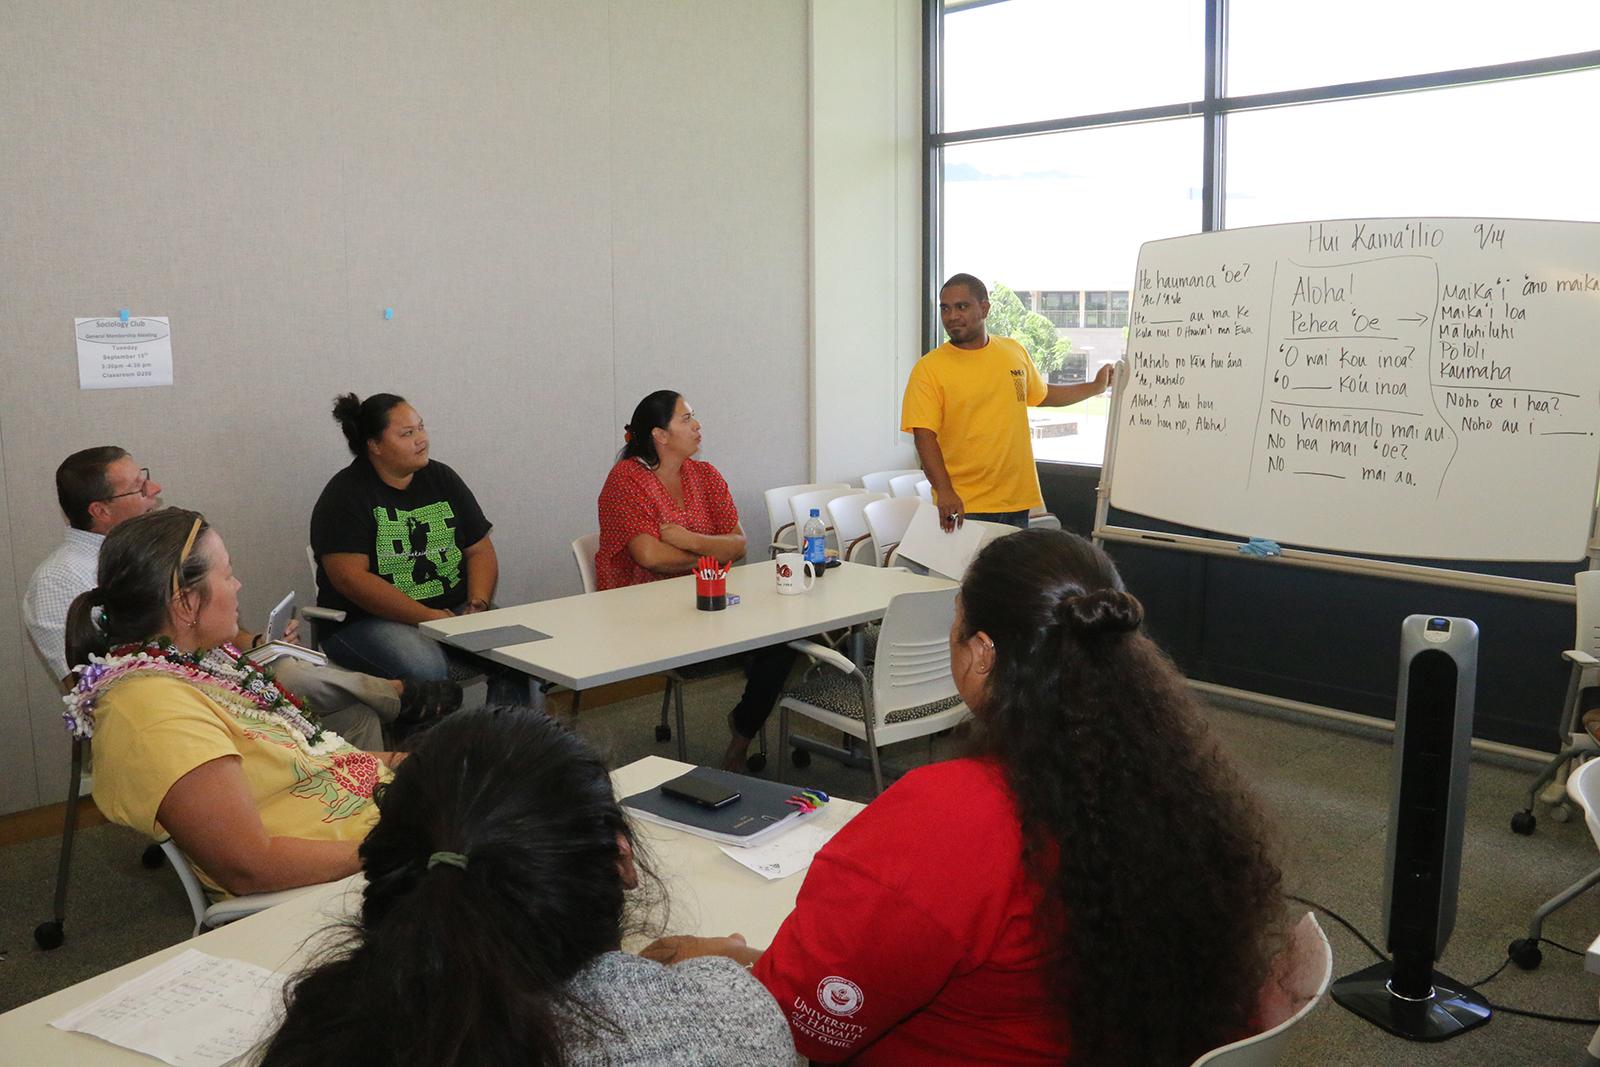 Hui Kama'ilio - Hawaiian Conversational Group